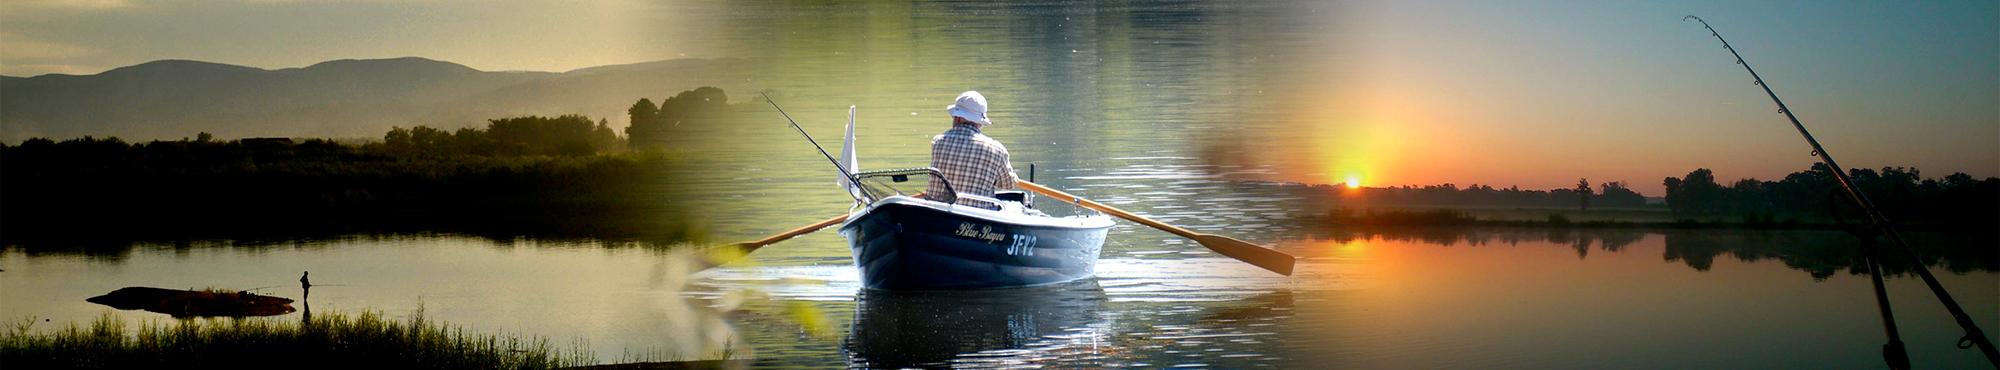 Angers pêche carte